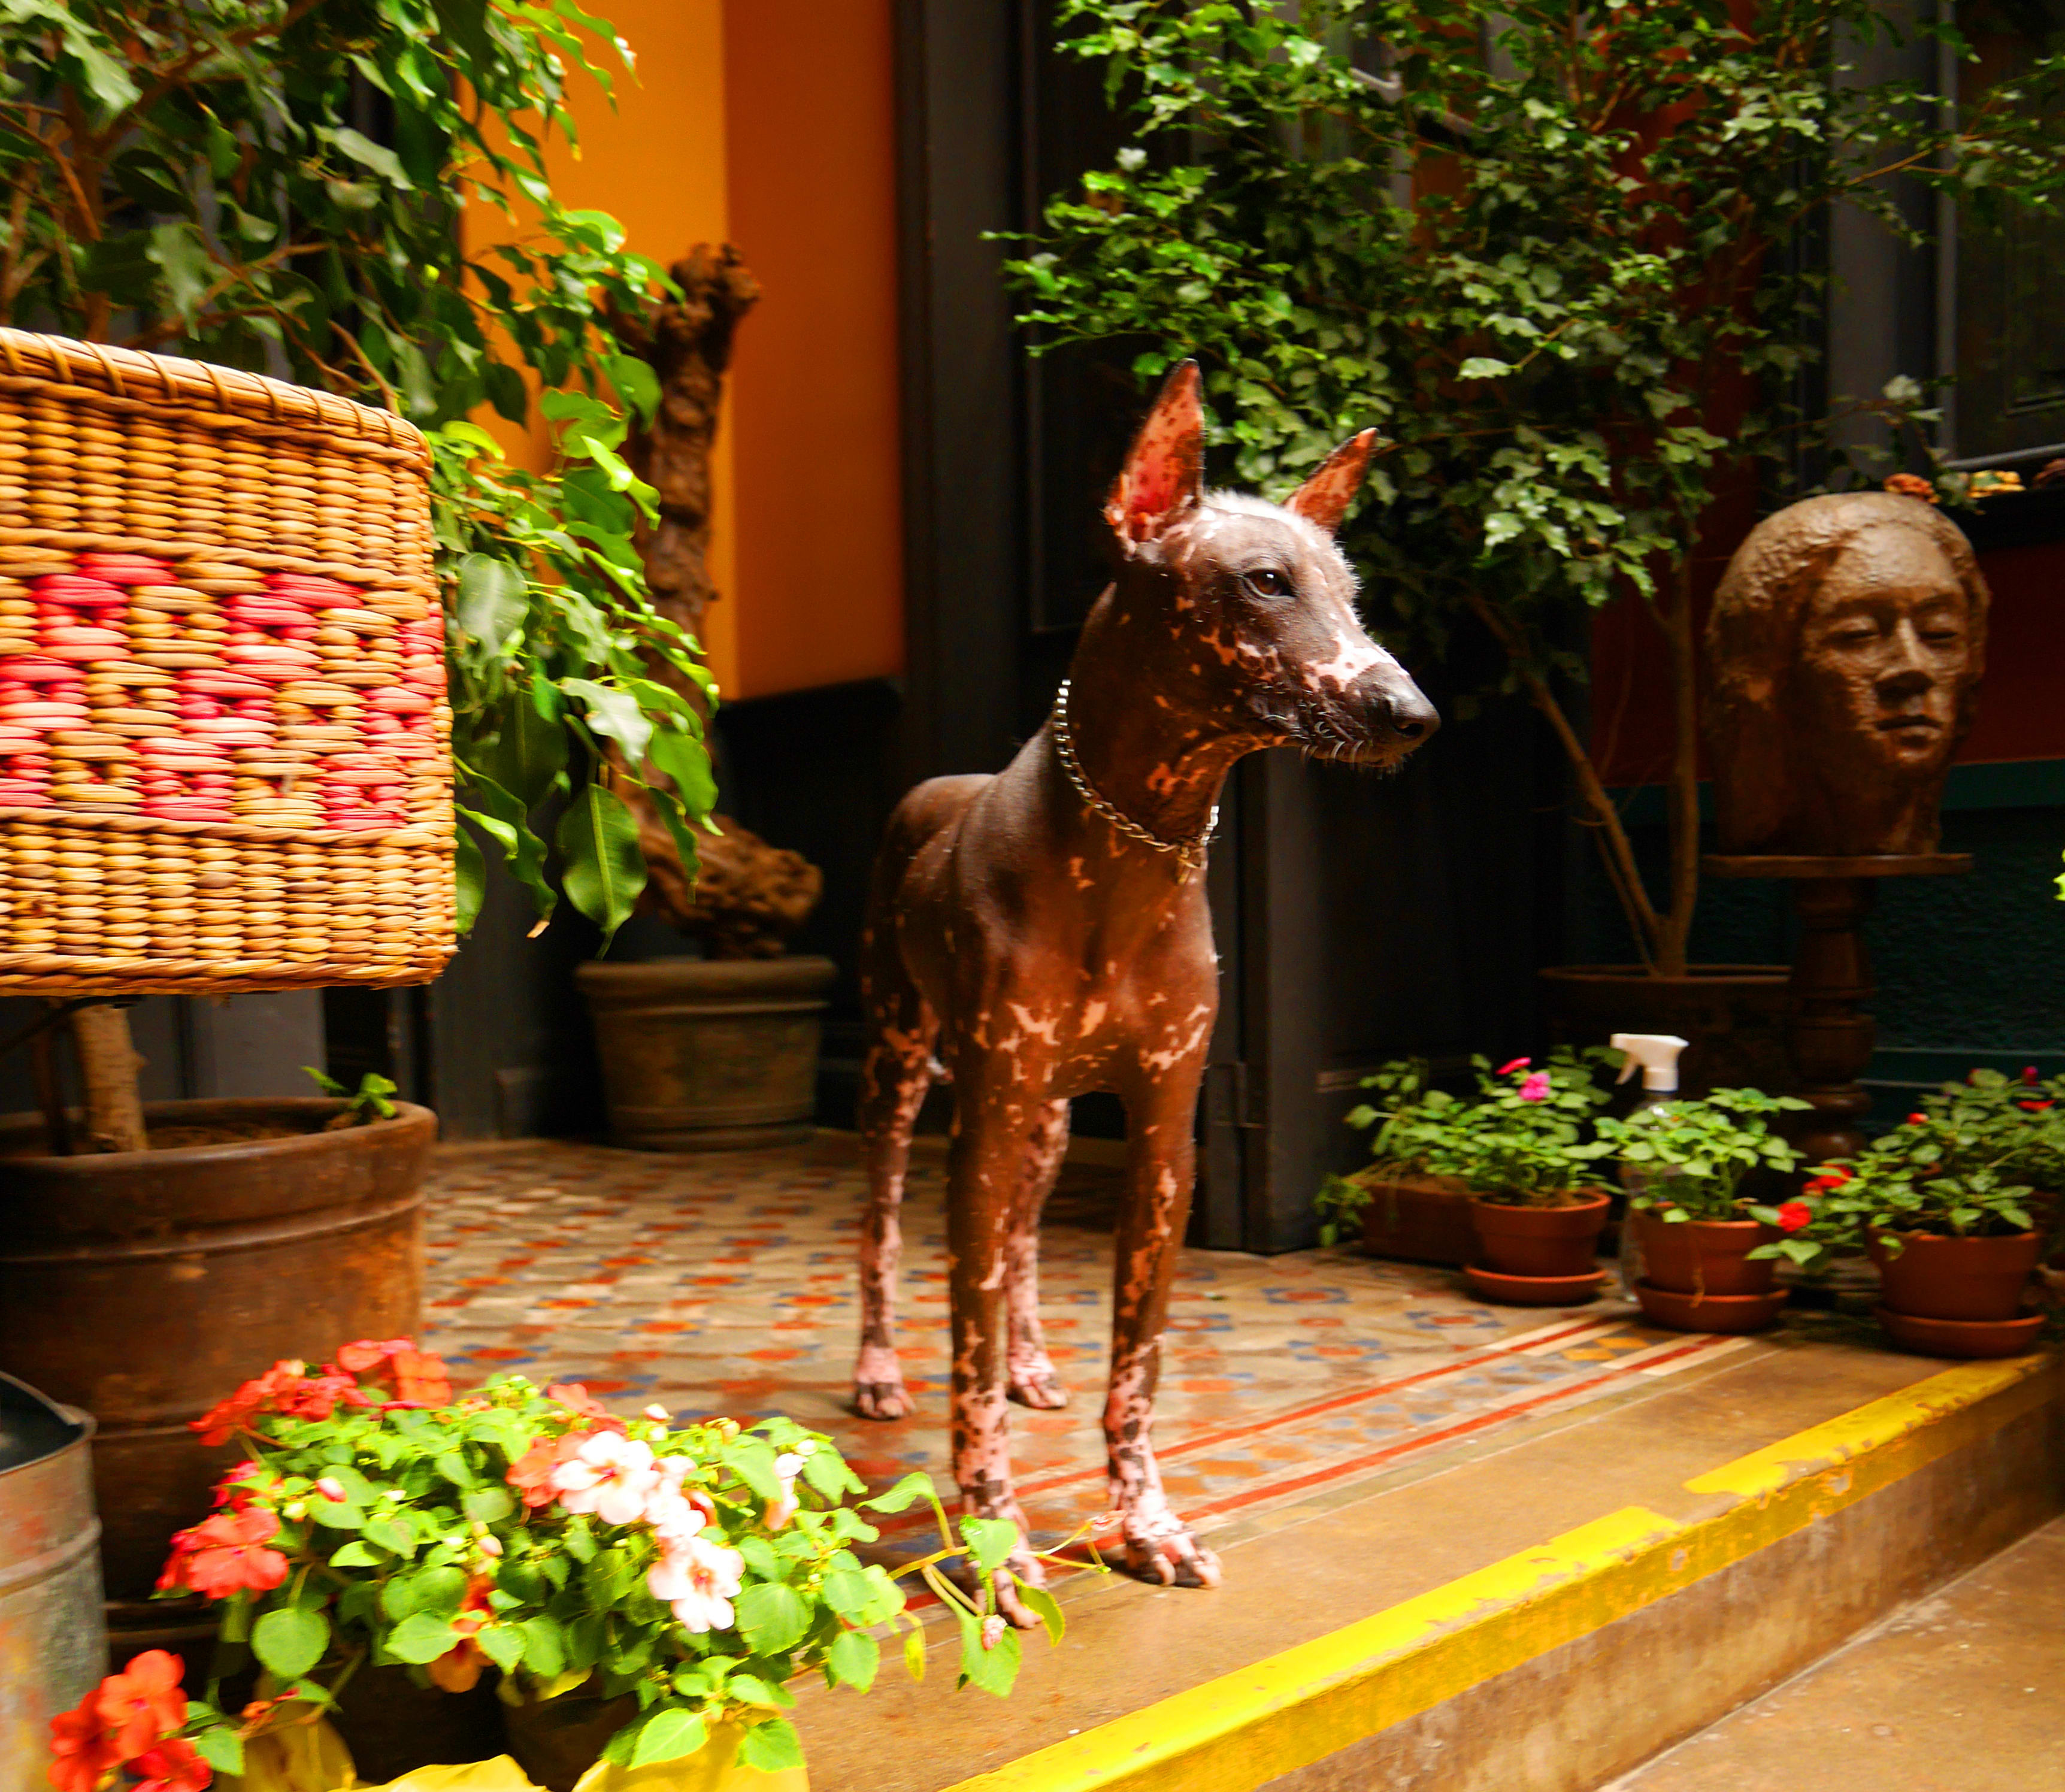 HOSTEL - KACLLA, The Healing Dog Hostel